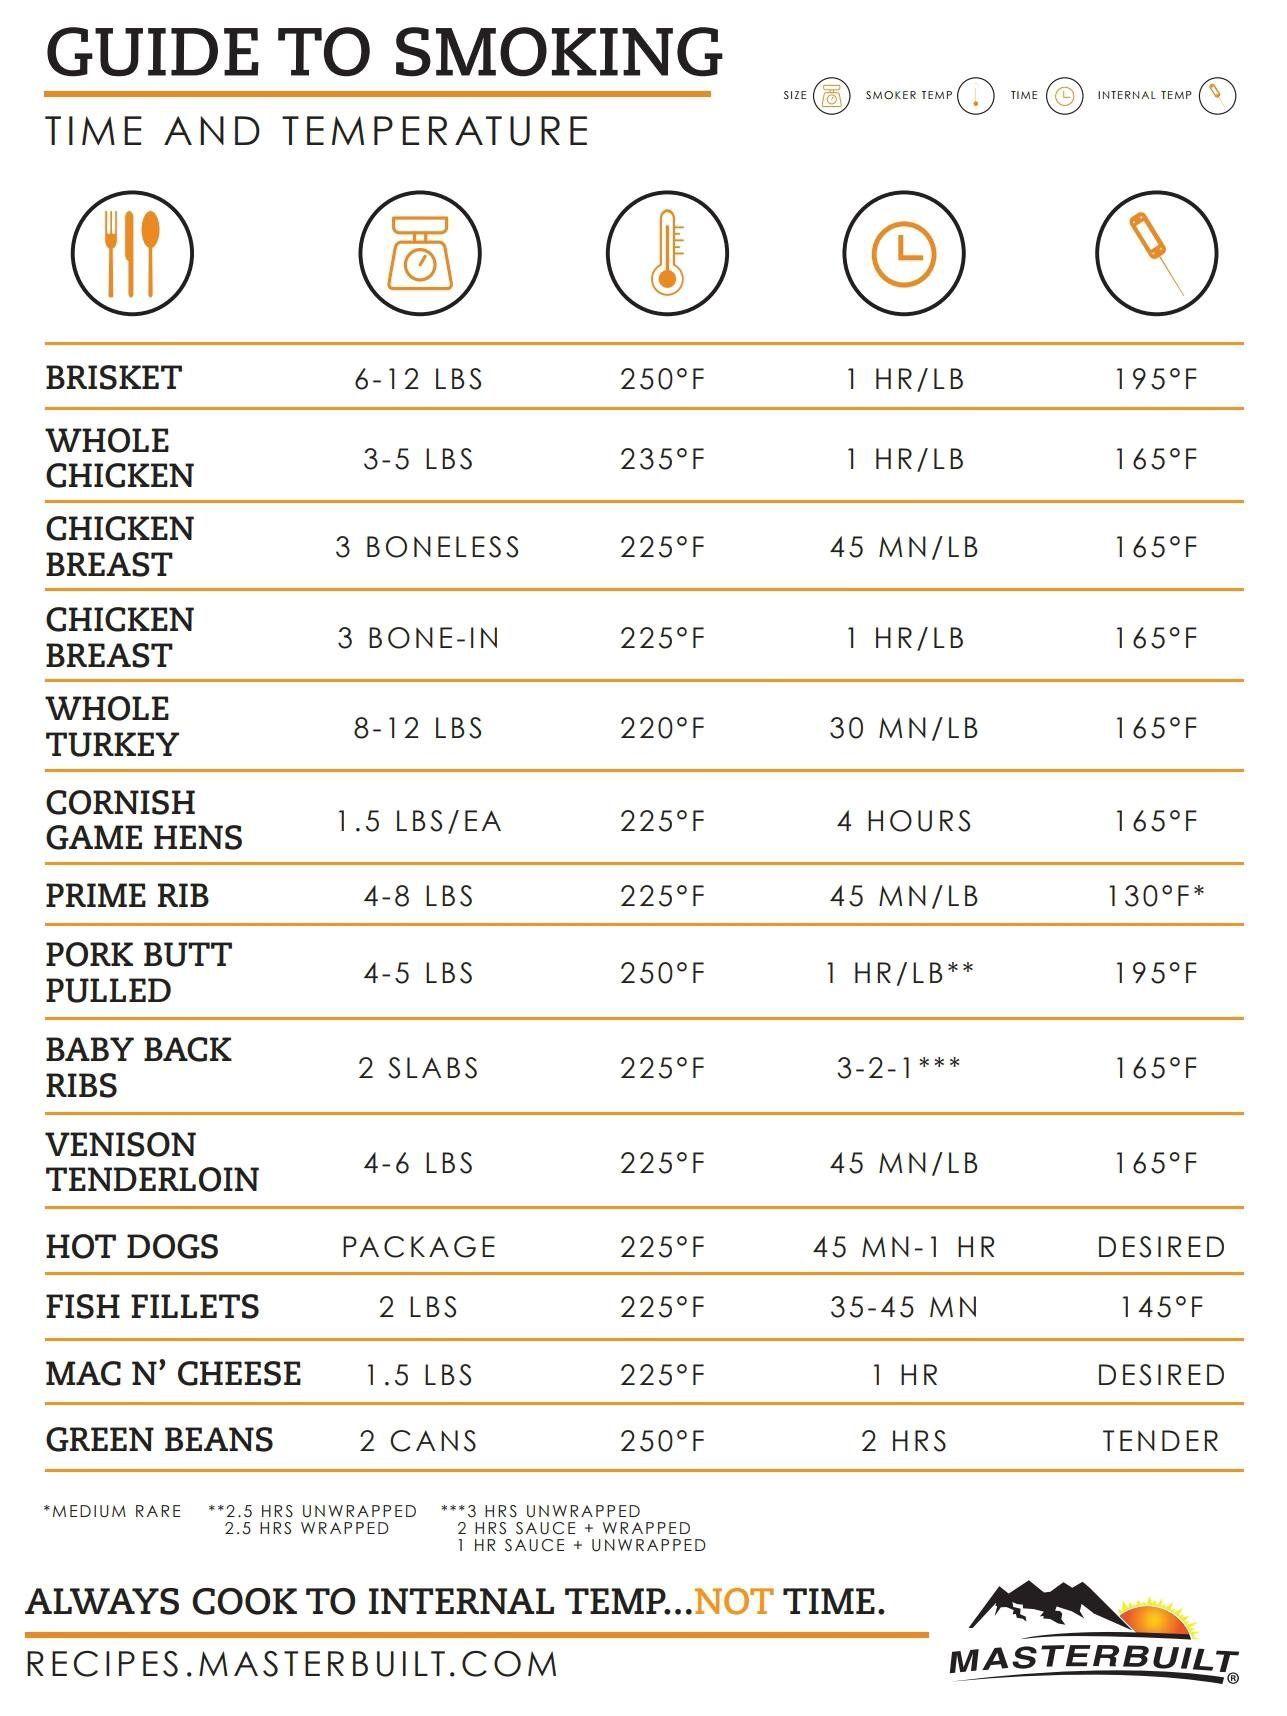 Pin by Luke Sinden on Cooking Smoked food recipes